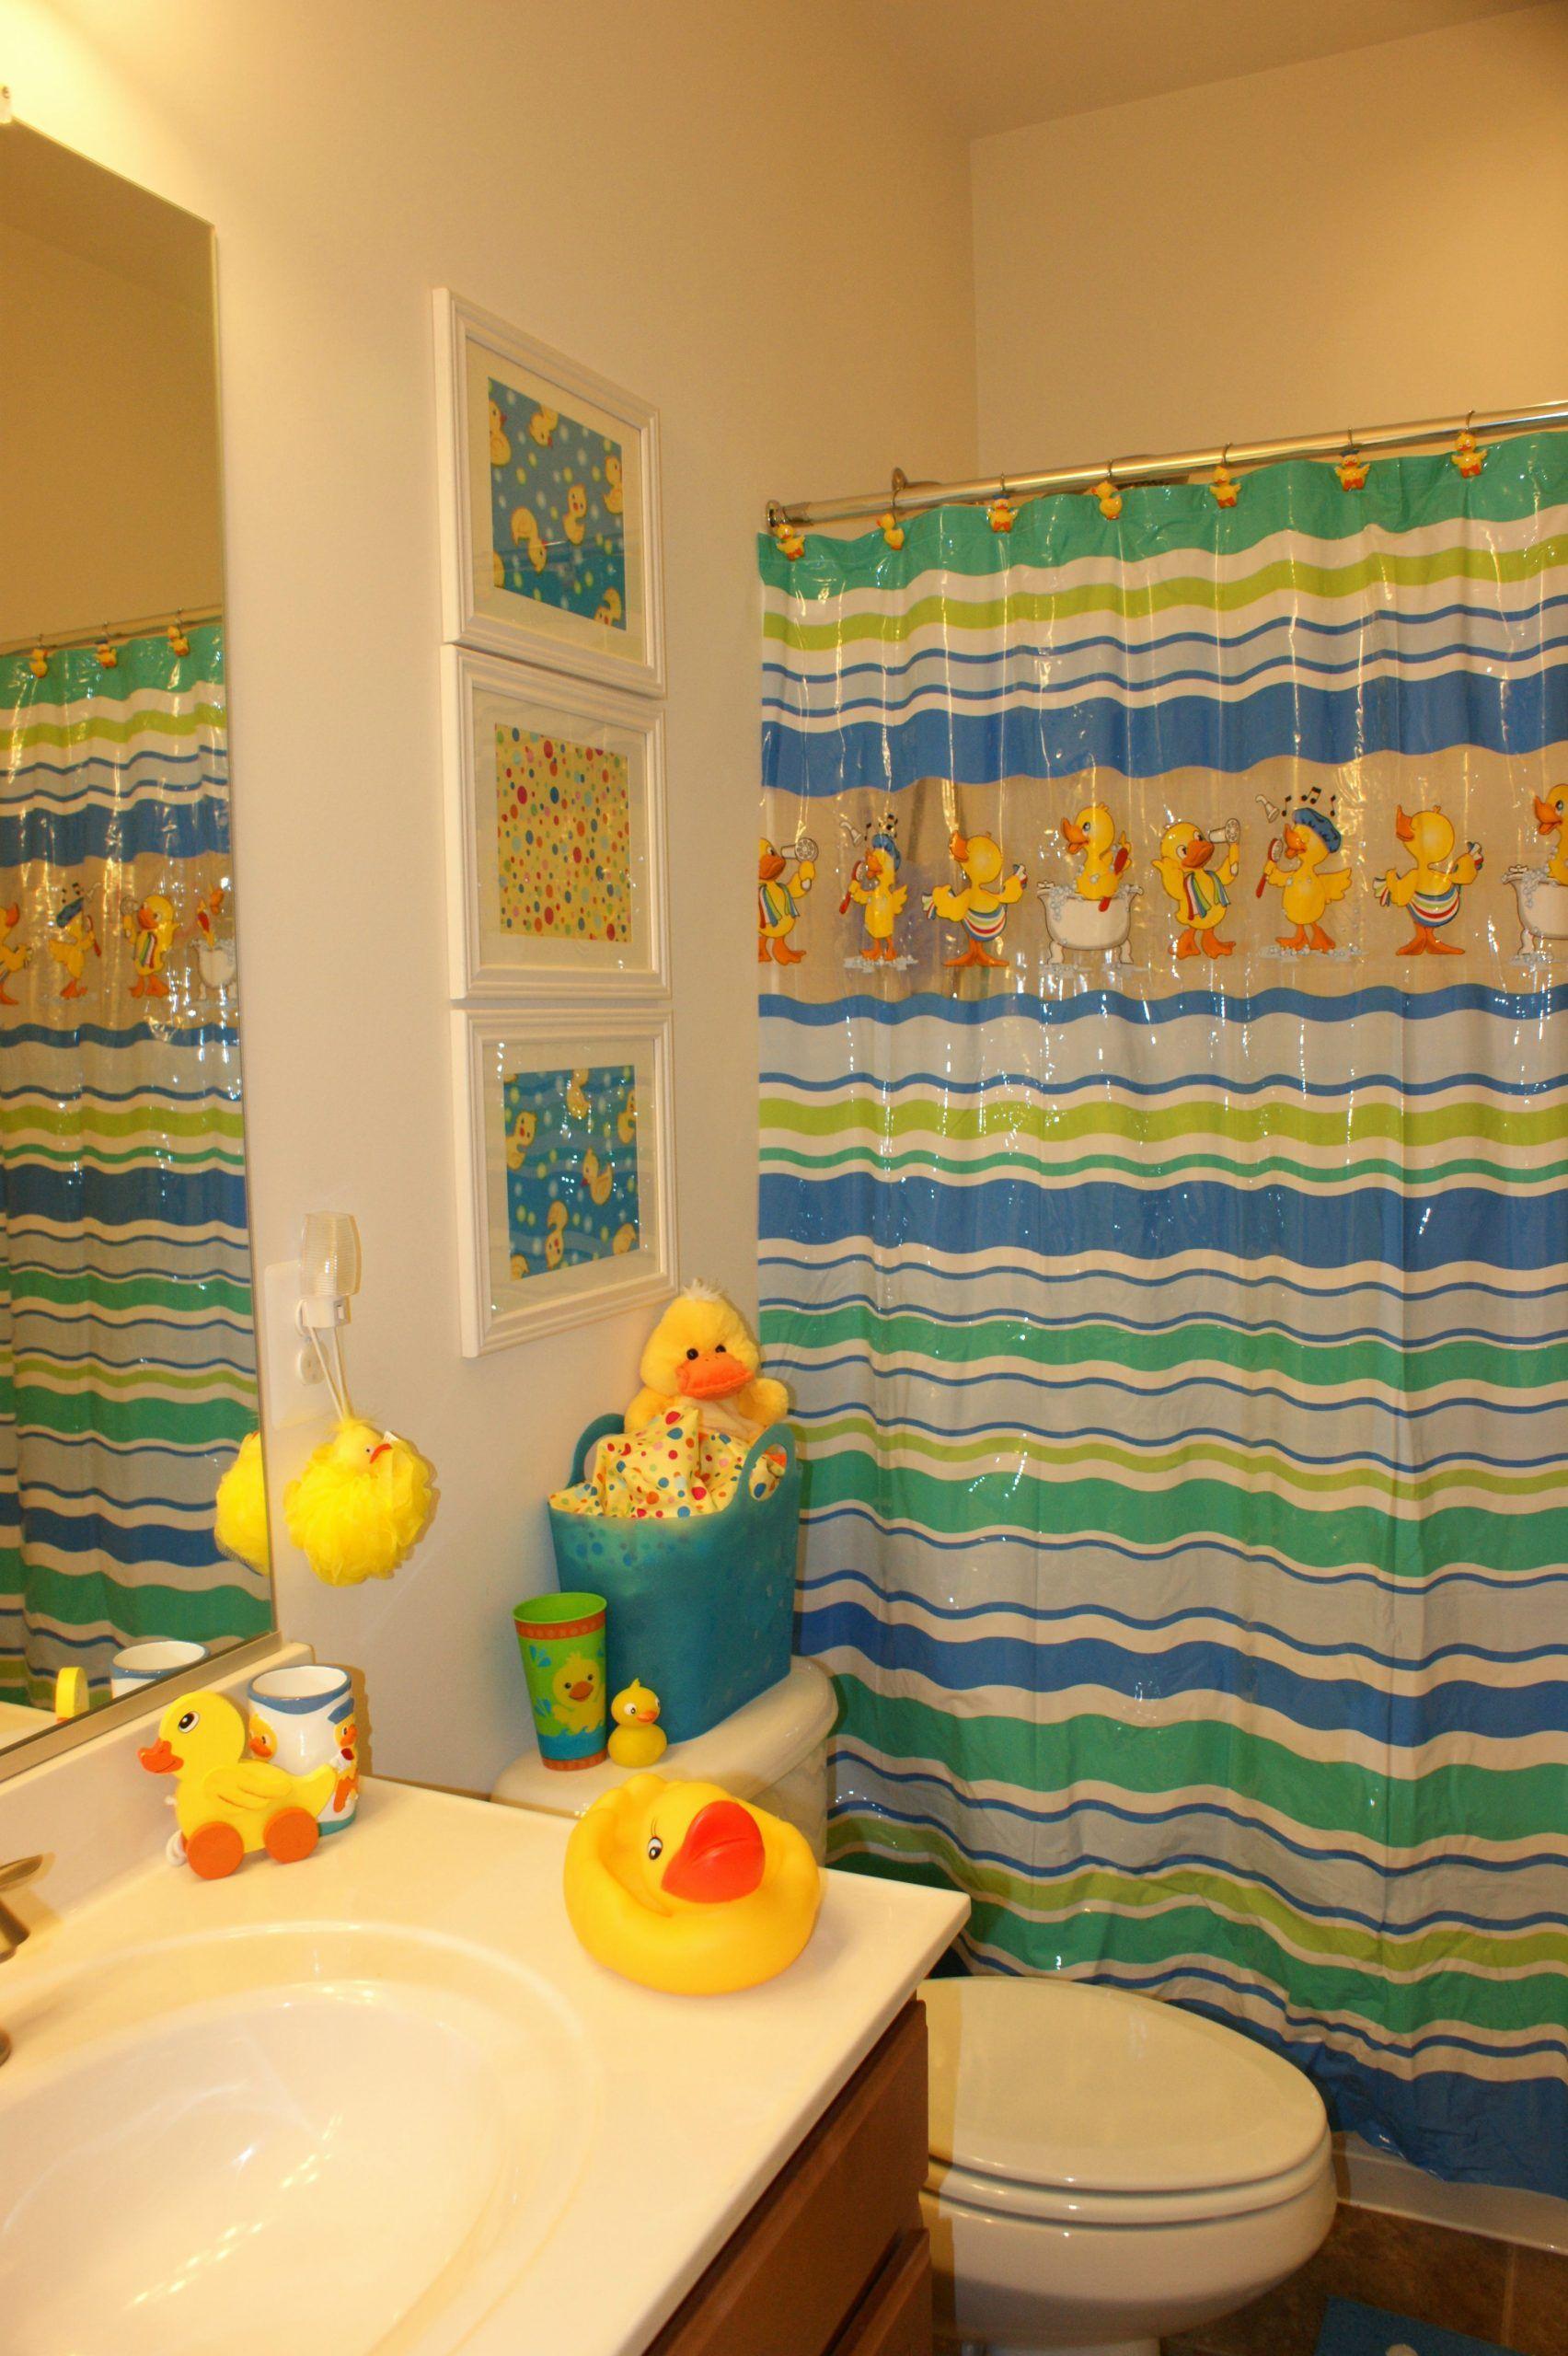 Rubber Ducky Bathroom Decor Fresh Duck Bathroom Decor for Kids in